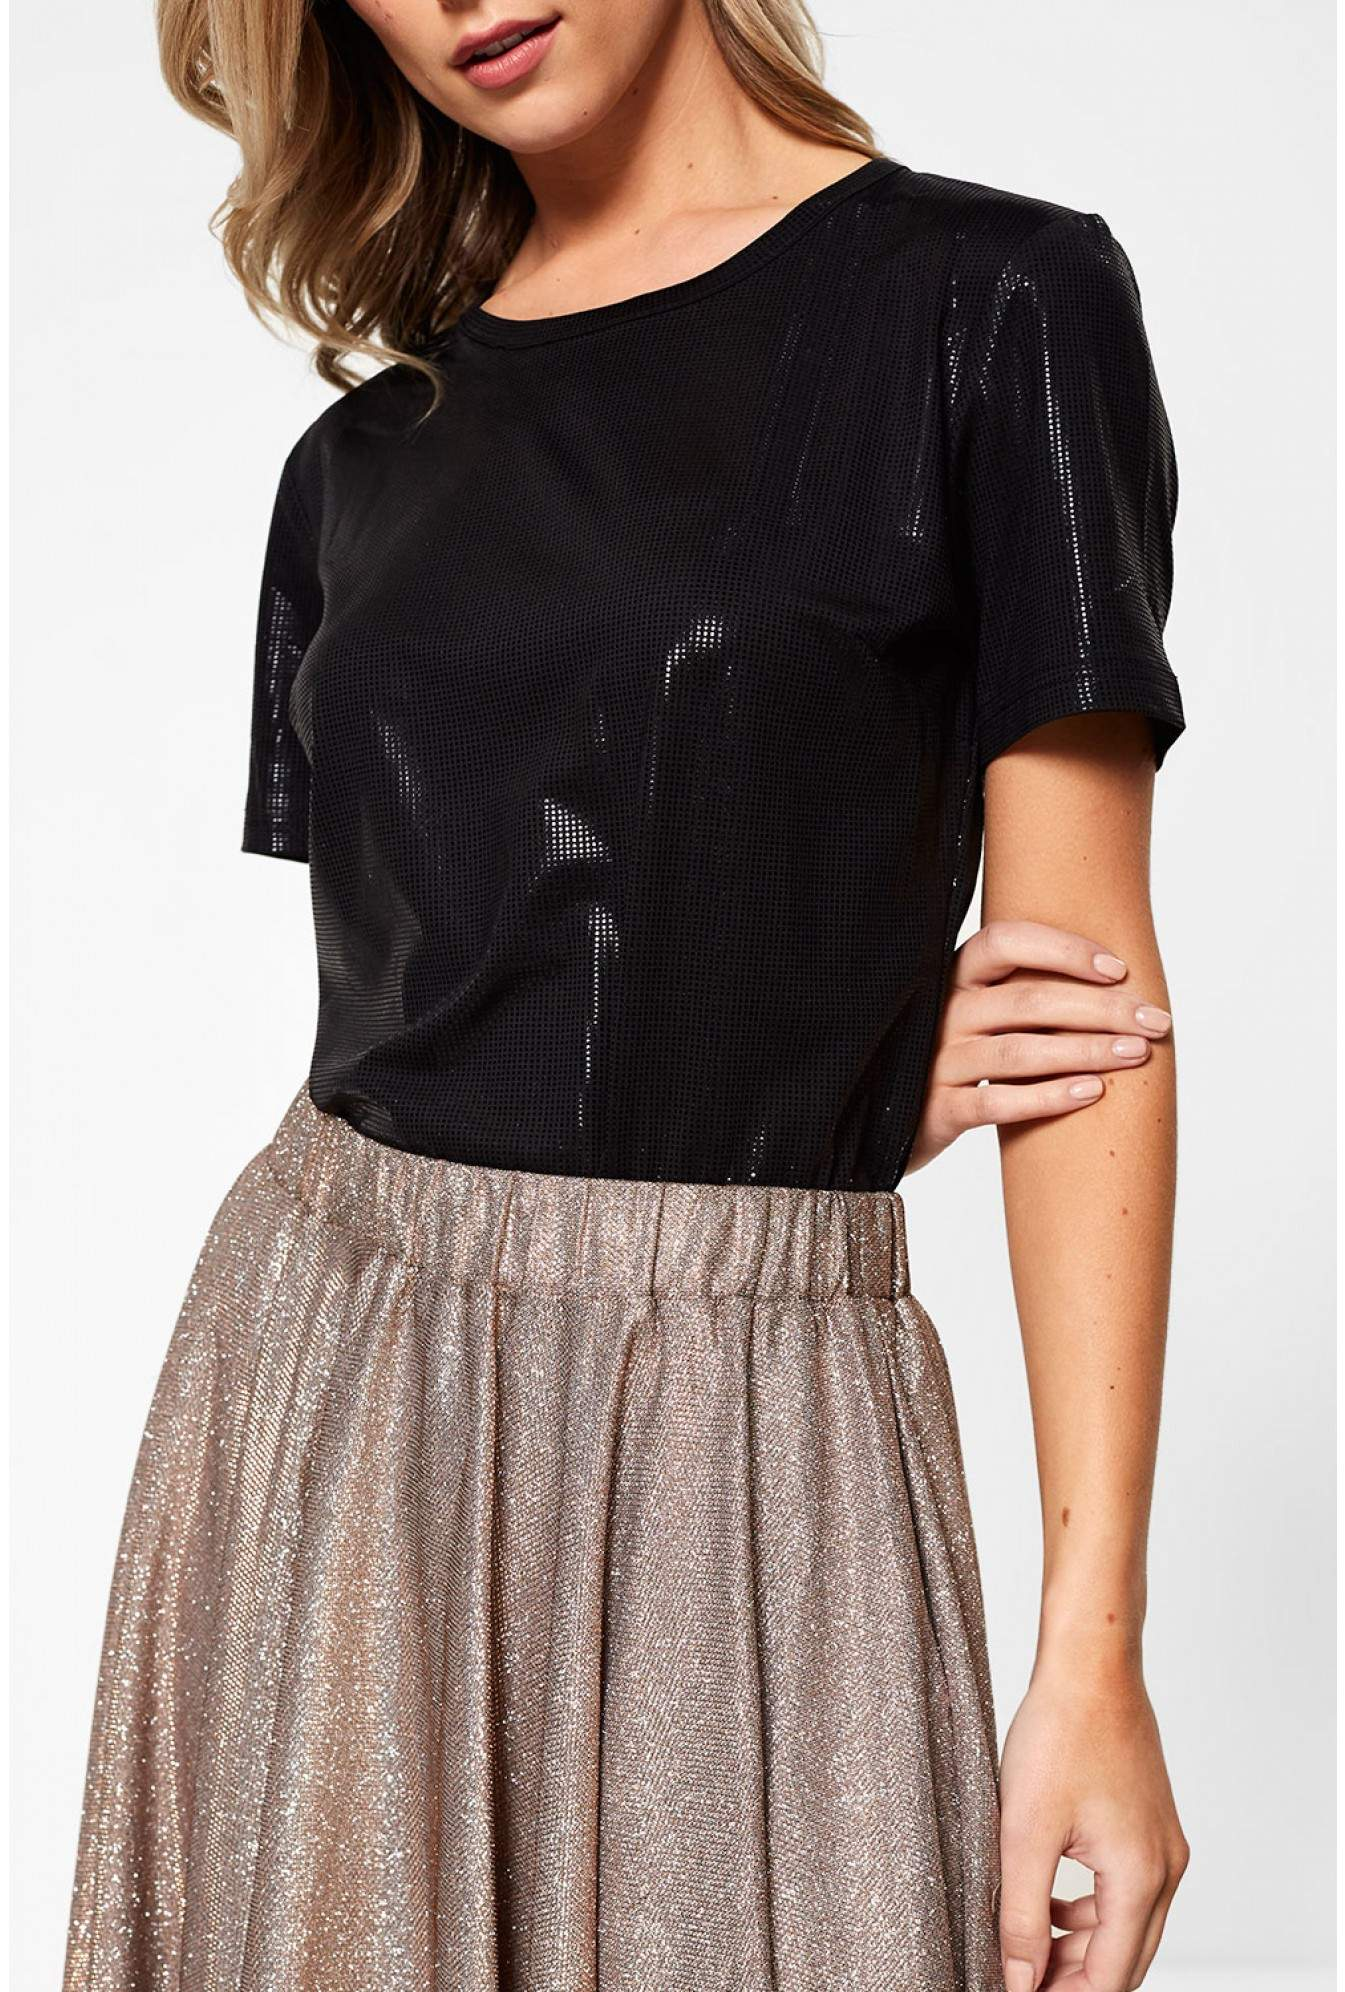 ff84de55cf19 Marc Angelo Lana Short Sleeve Top in Metallic Black | iCLOTHING